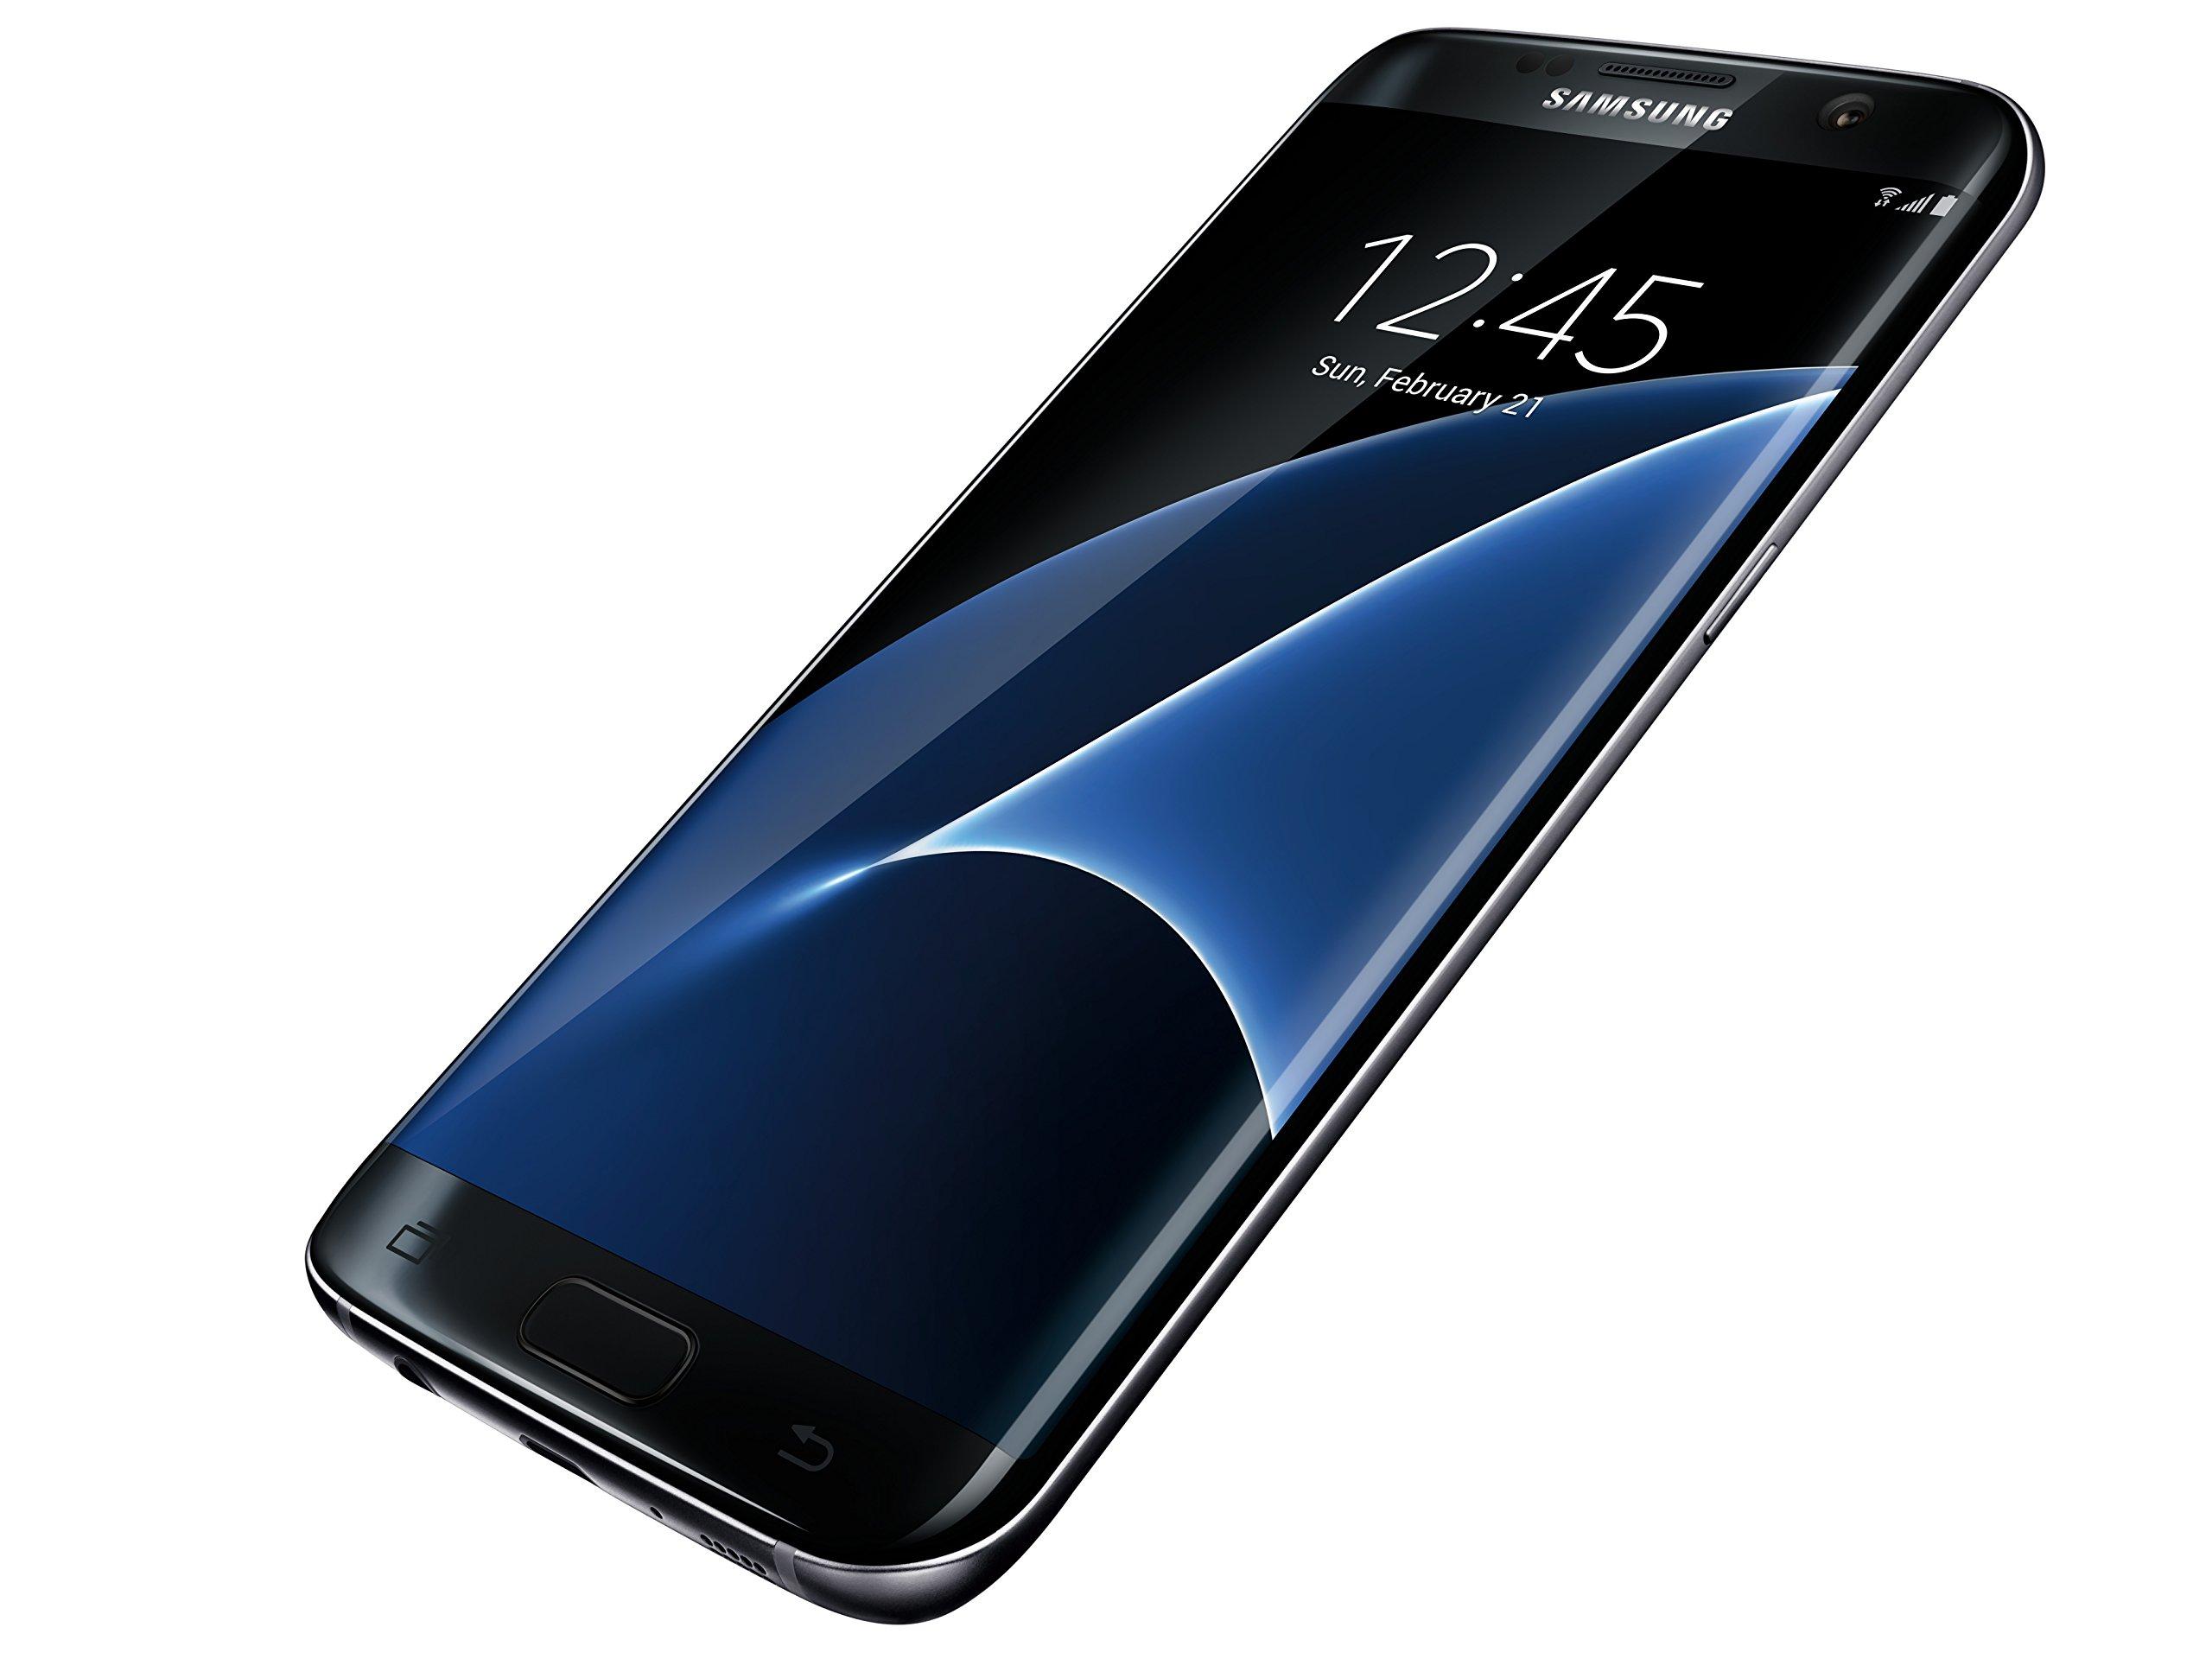 Samsung Galaxy S7 Edge G935F Factory Unlocked Phone 32 GB, No Warranty - International Version (Black Onyx) by Samsung (Image #9)